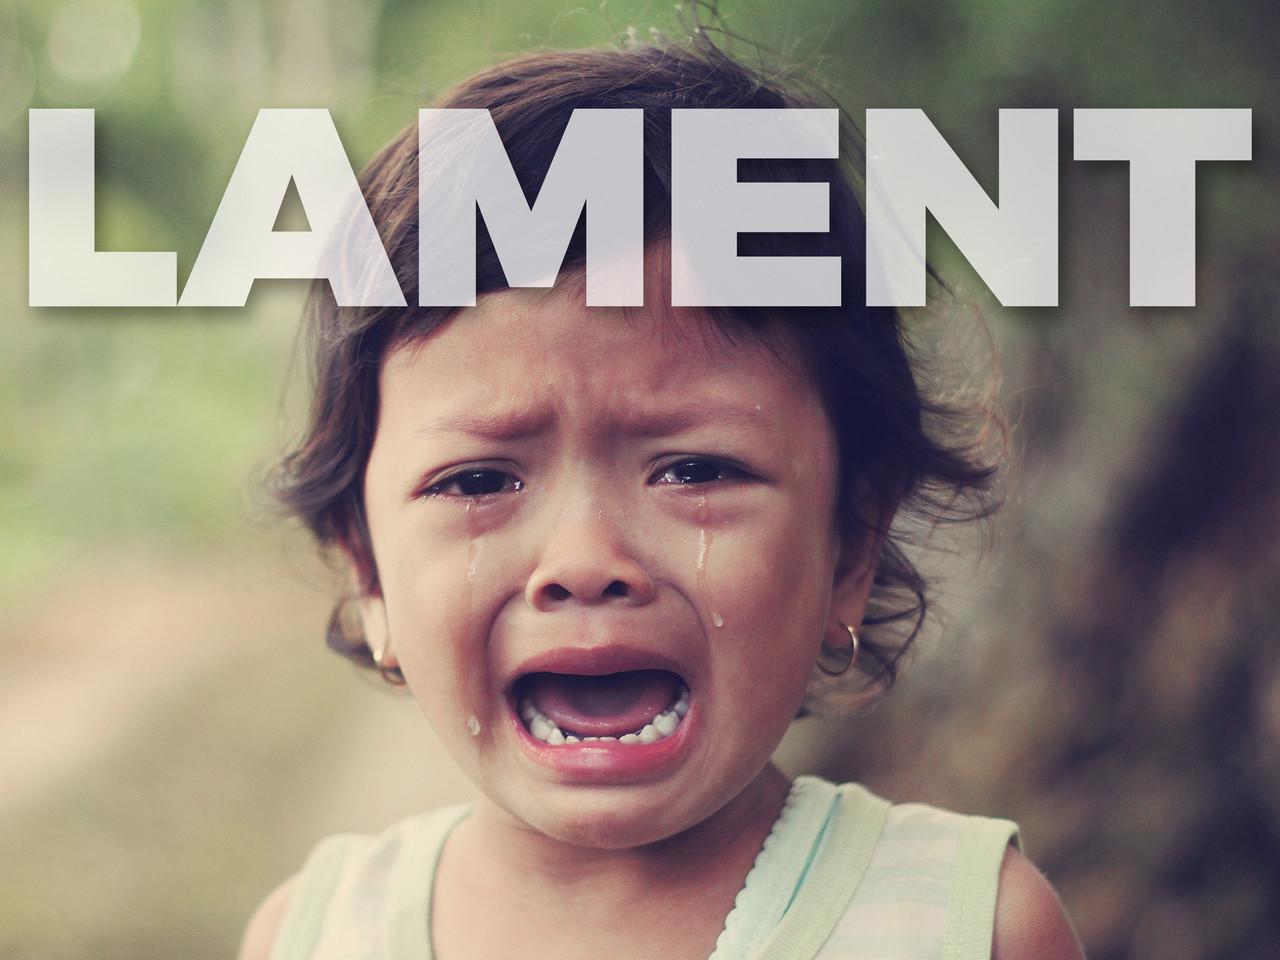 Jeremiah: Lament (Jer  8:18-9:6) | Neighborhood Bible Church